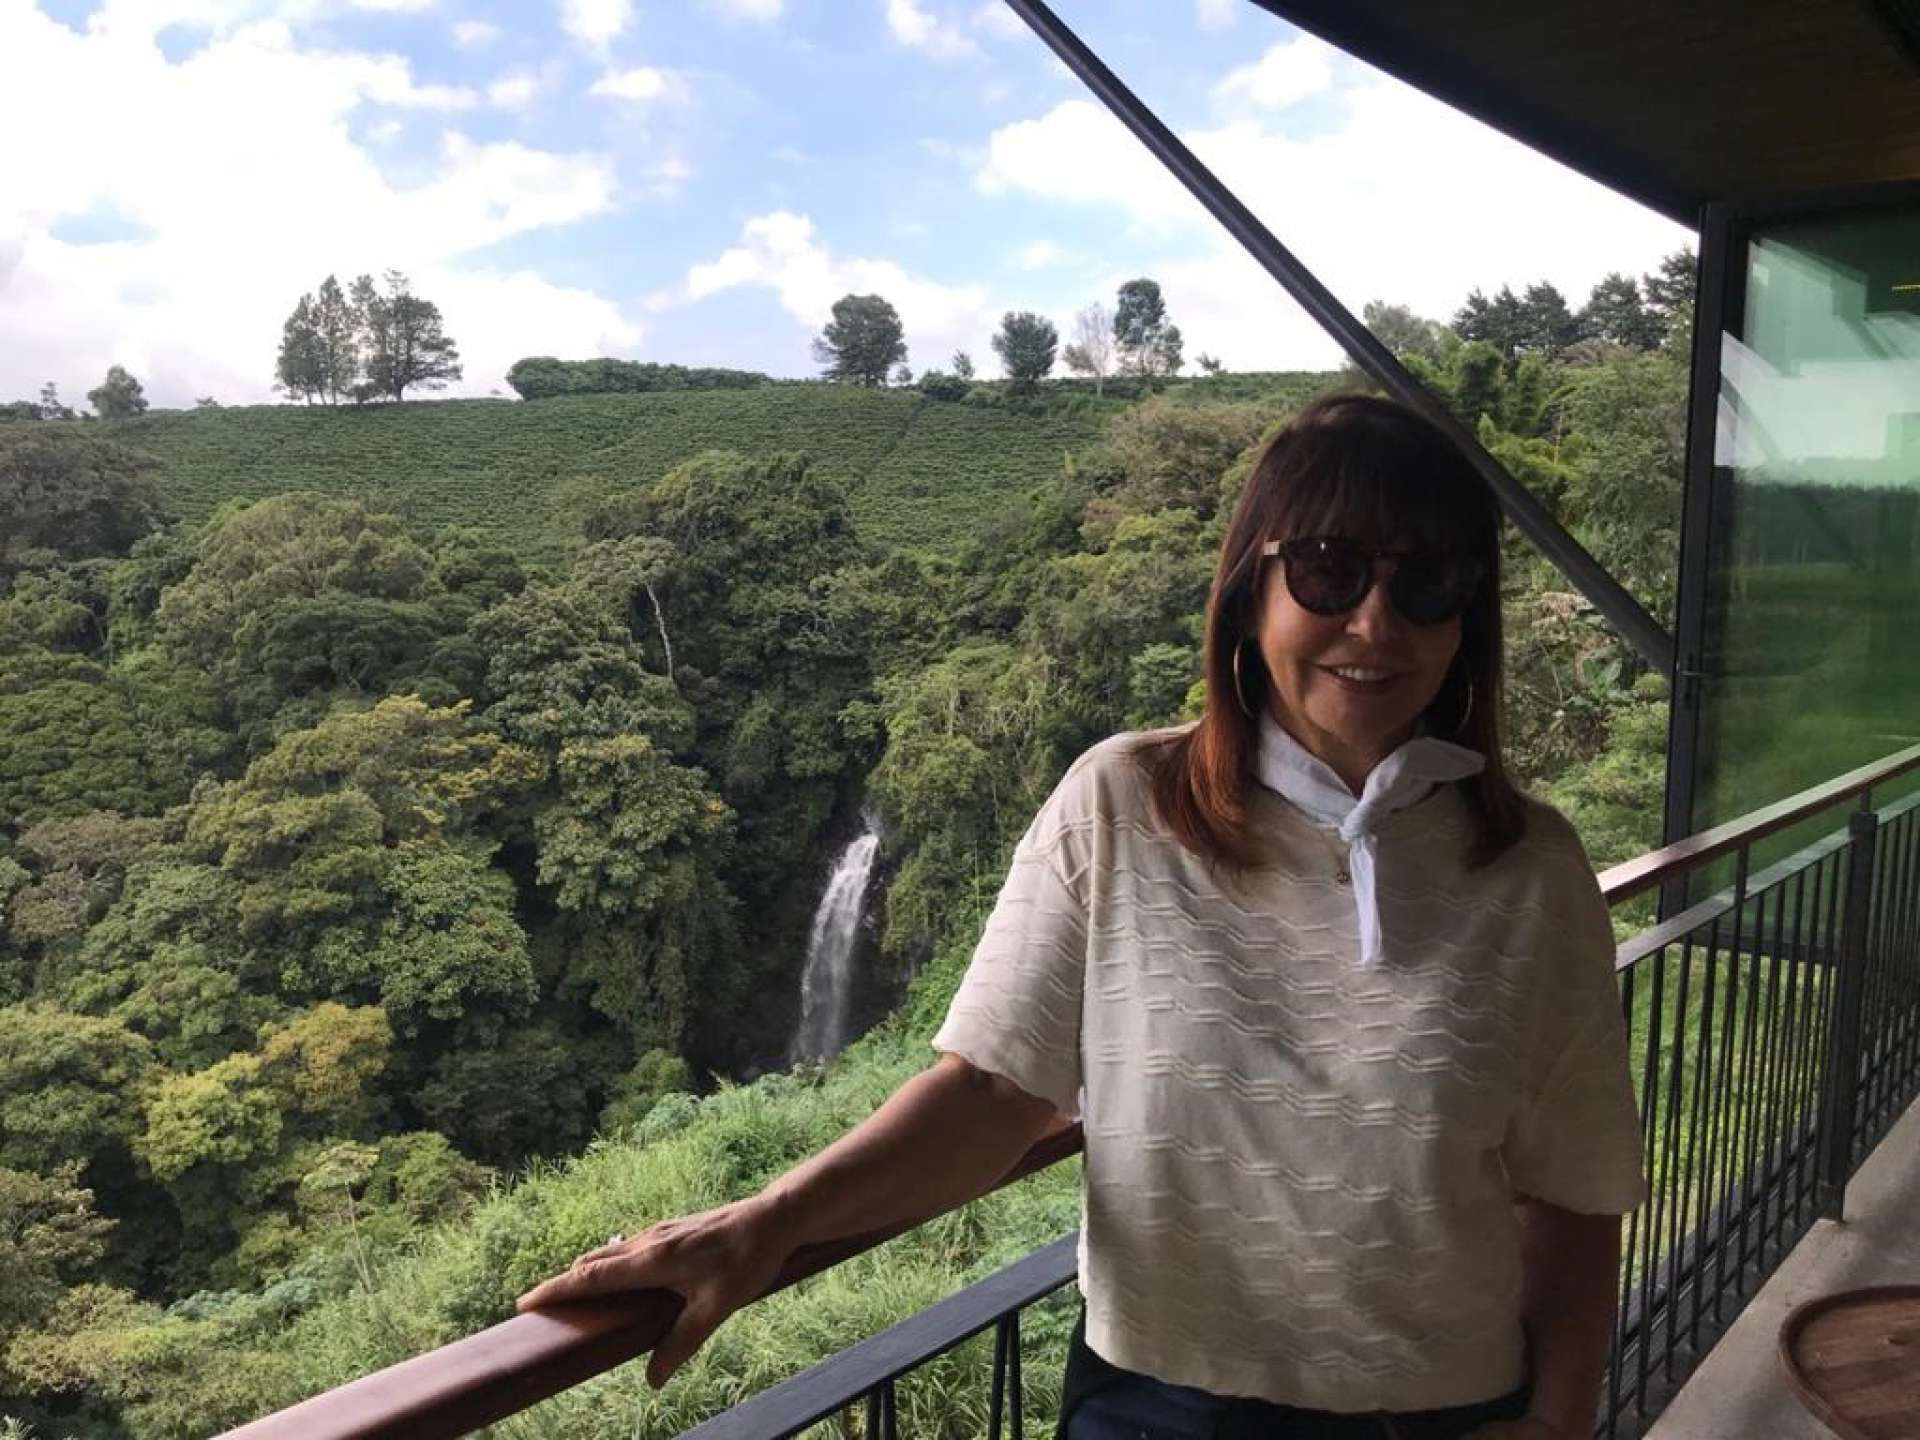 Socióloga Miriam Abramovay, coordenadora da área de Juventude e Políticas Públicas da Faculdade Latino-Americana de Ciências Sociais (Flacso Brasil)